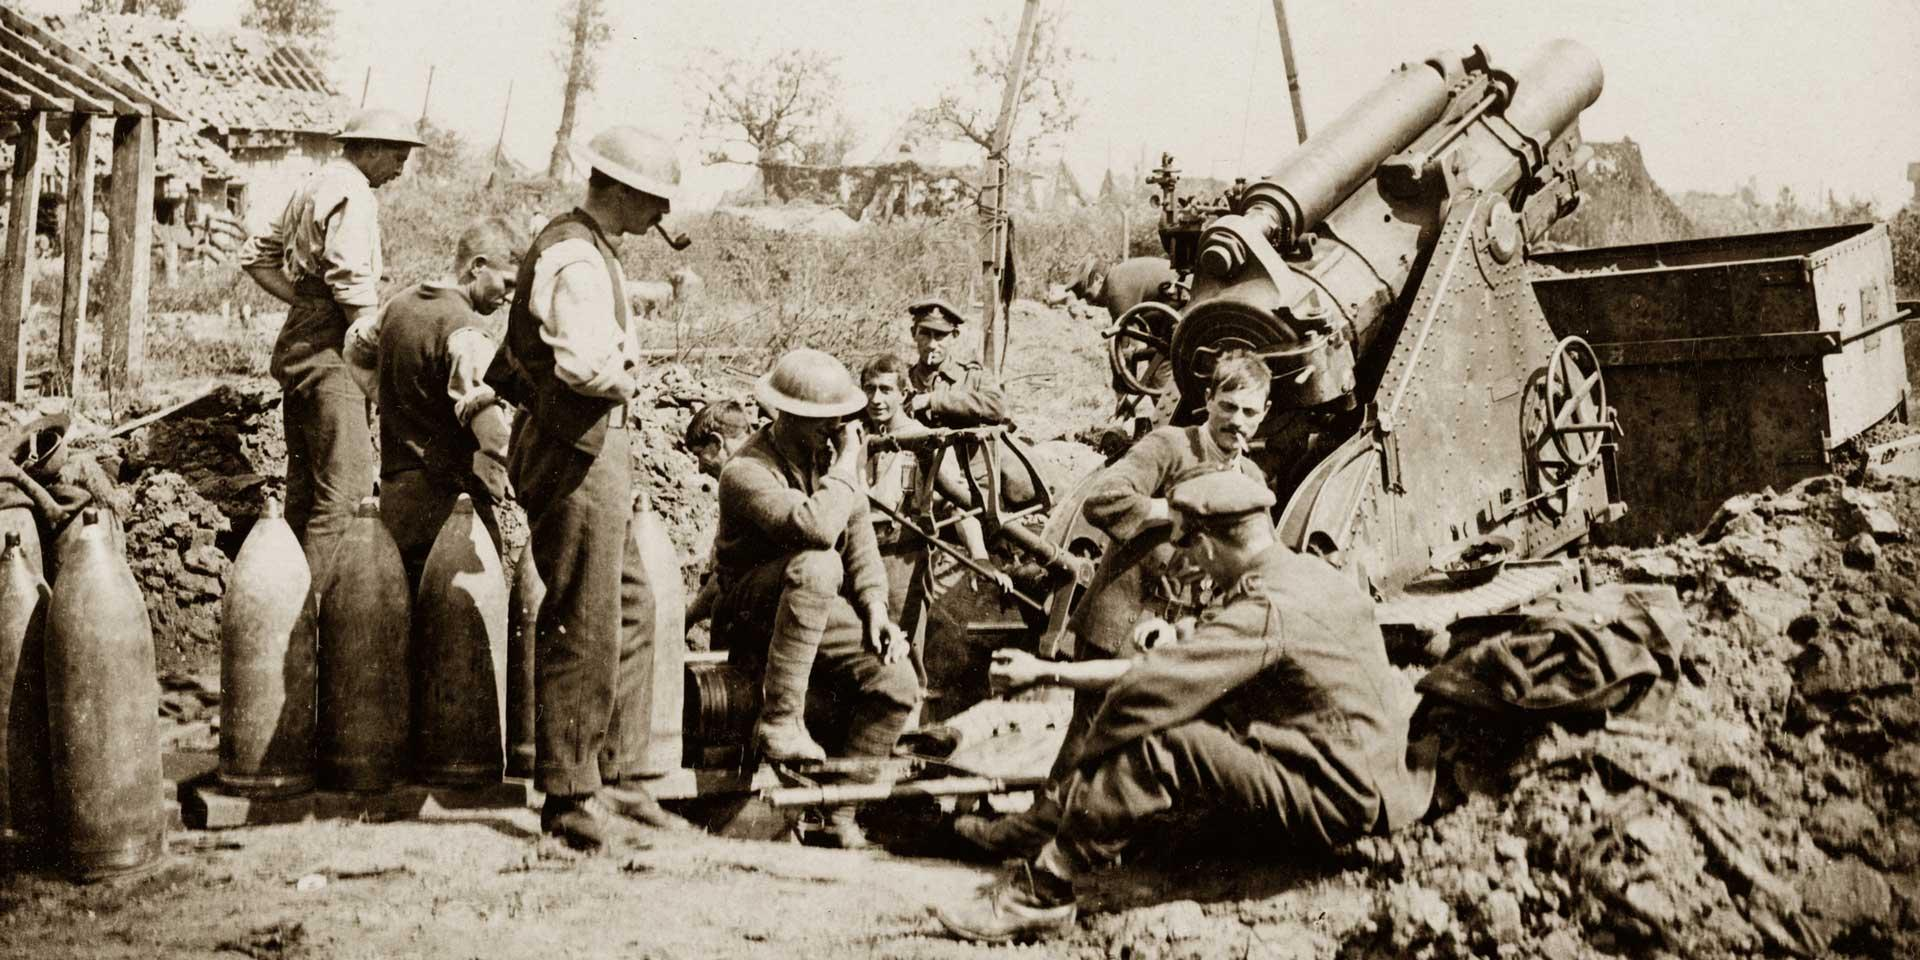 British gunners take a break during the bombardment of Zonnebeke, 1917